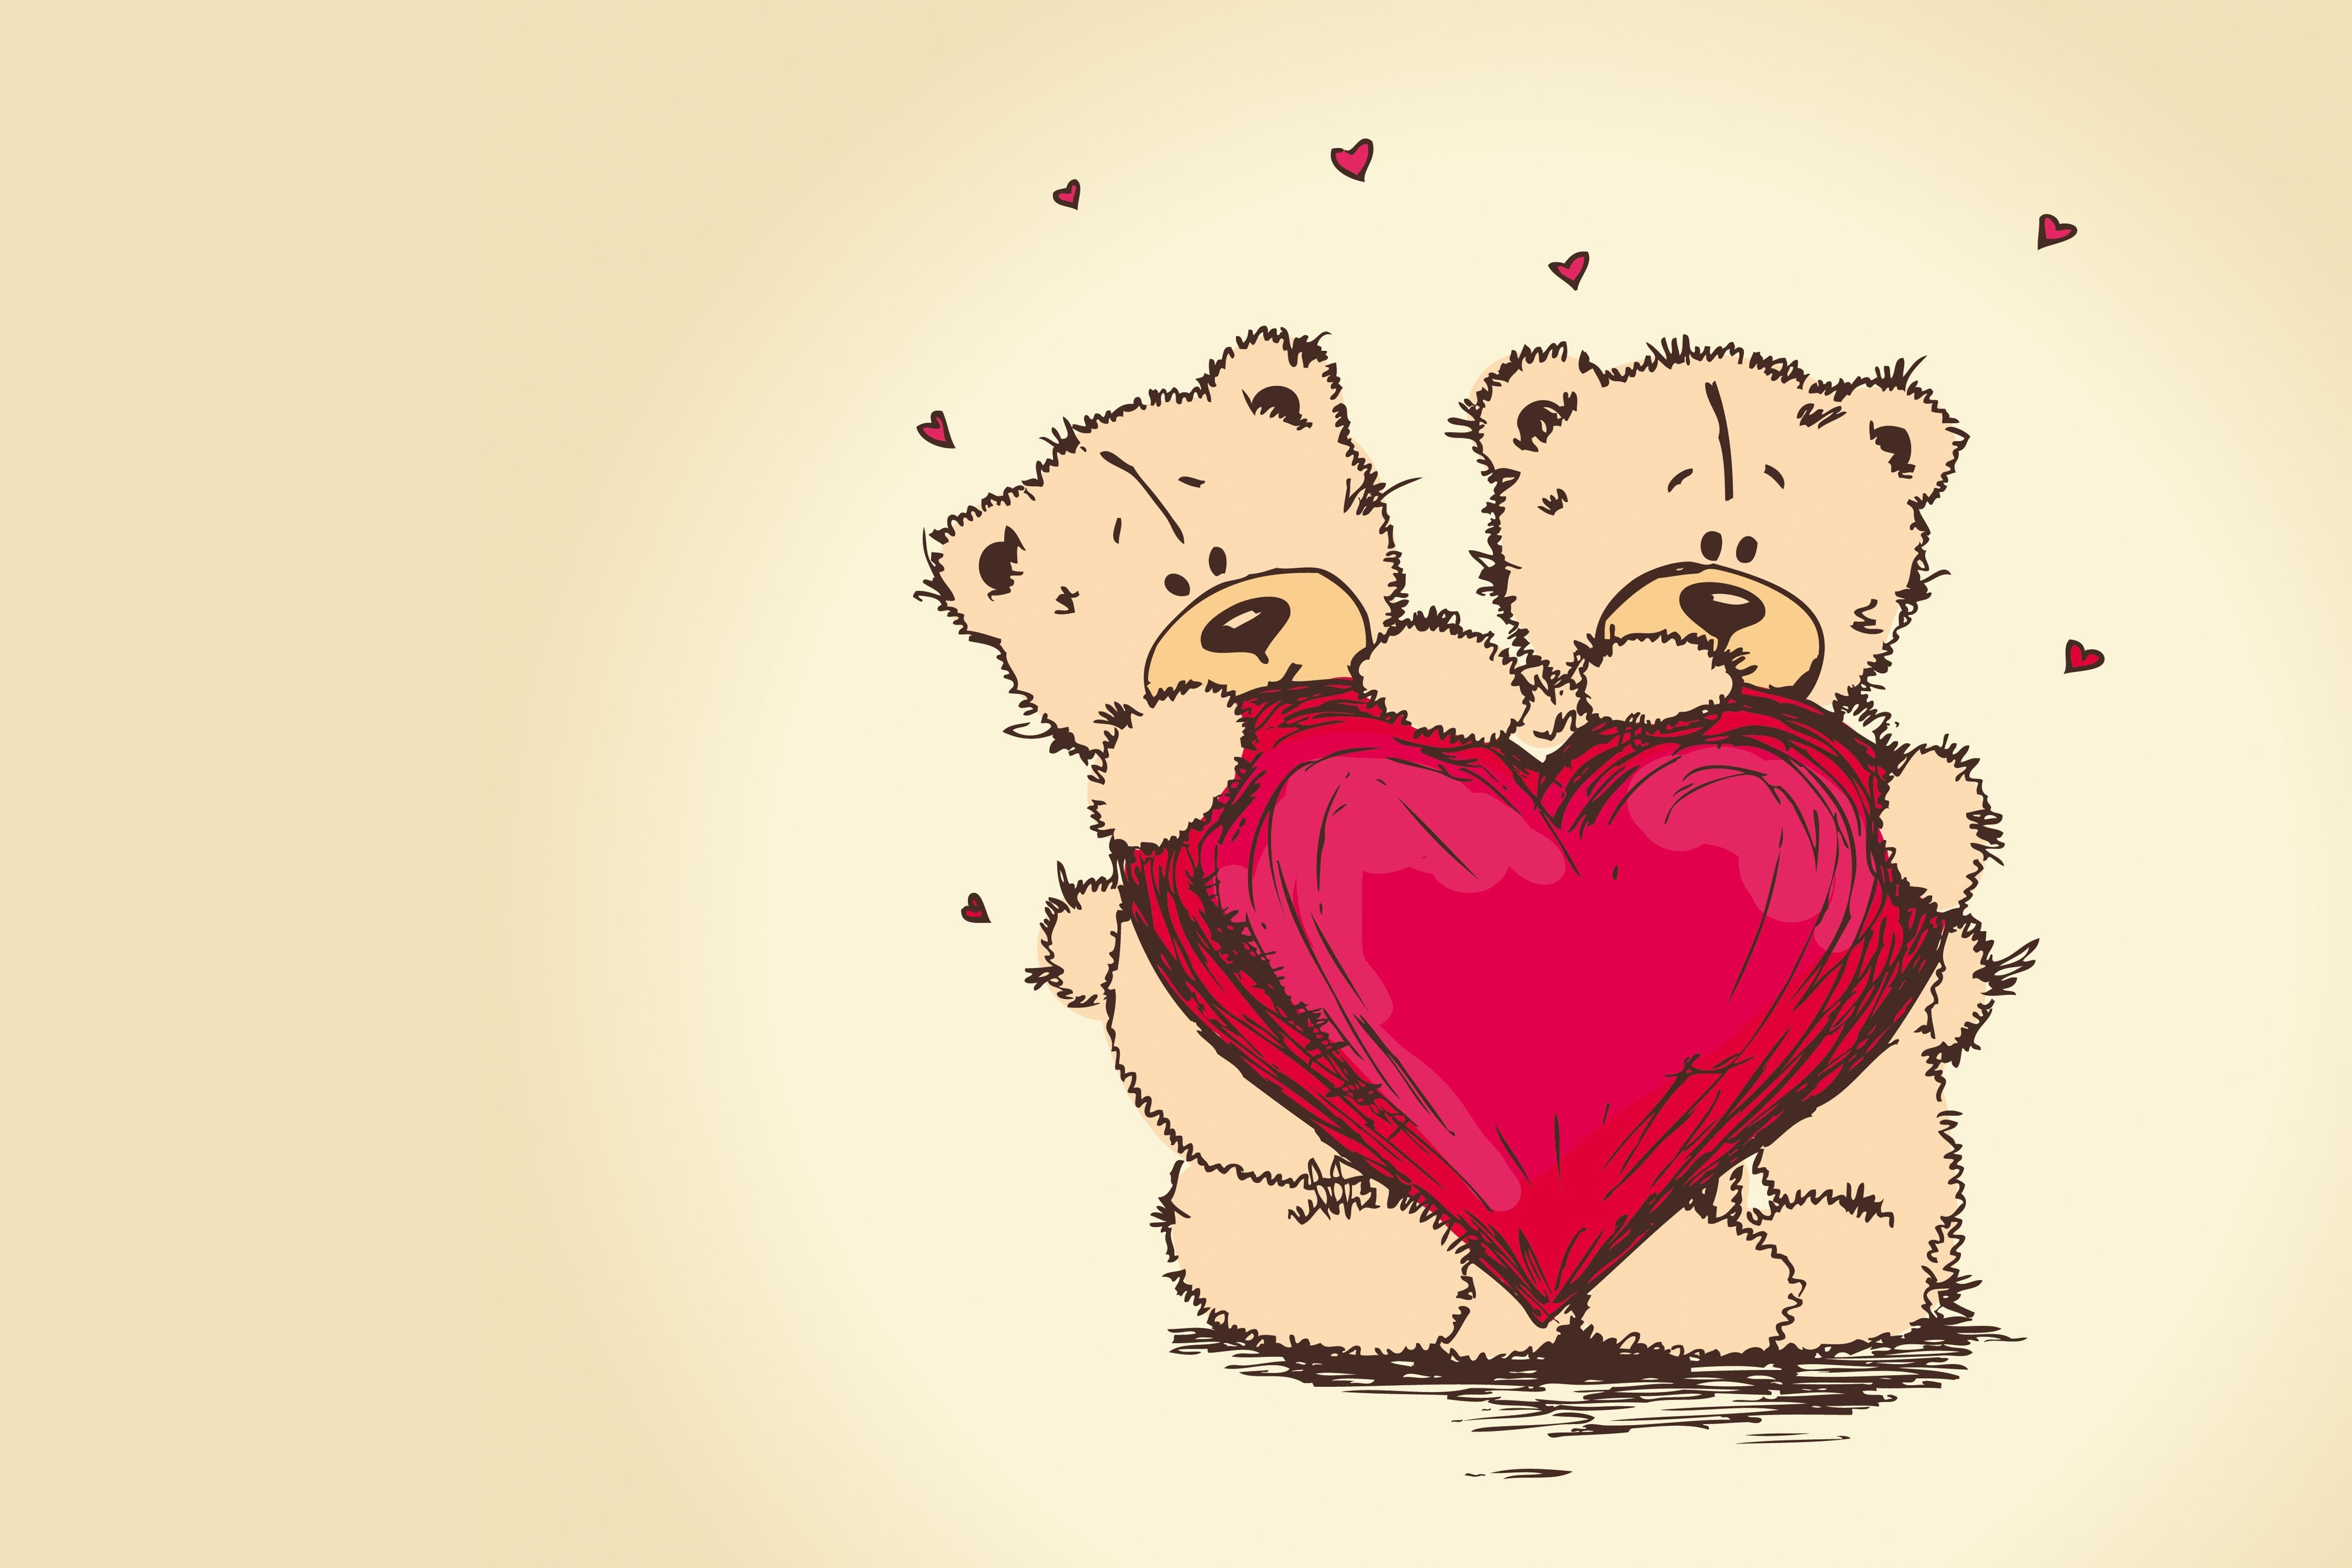 Открытка мишка с сердечком, анимашки именами картинка